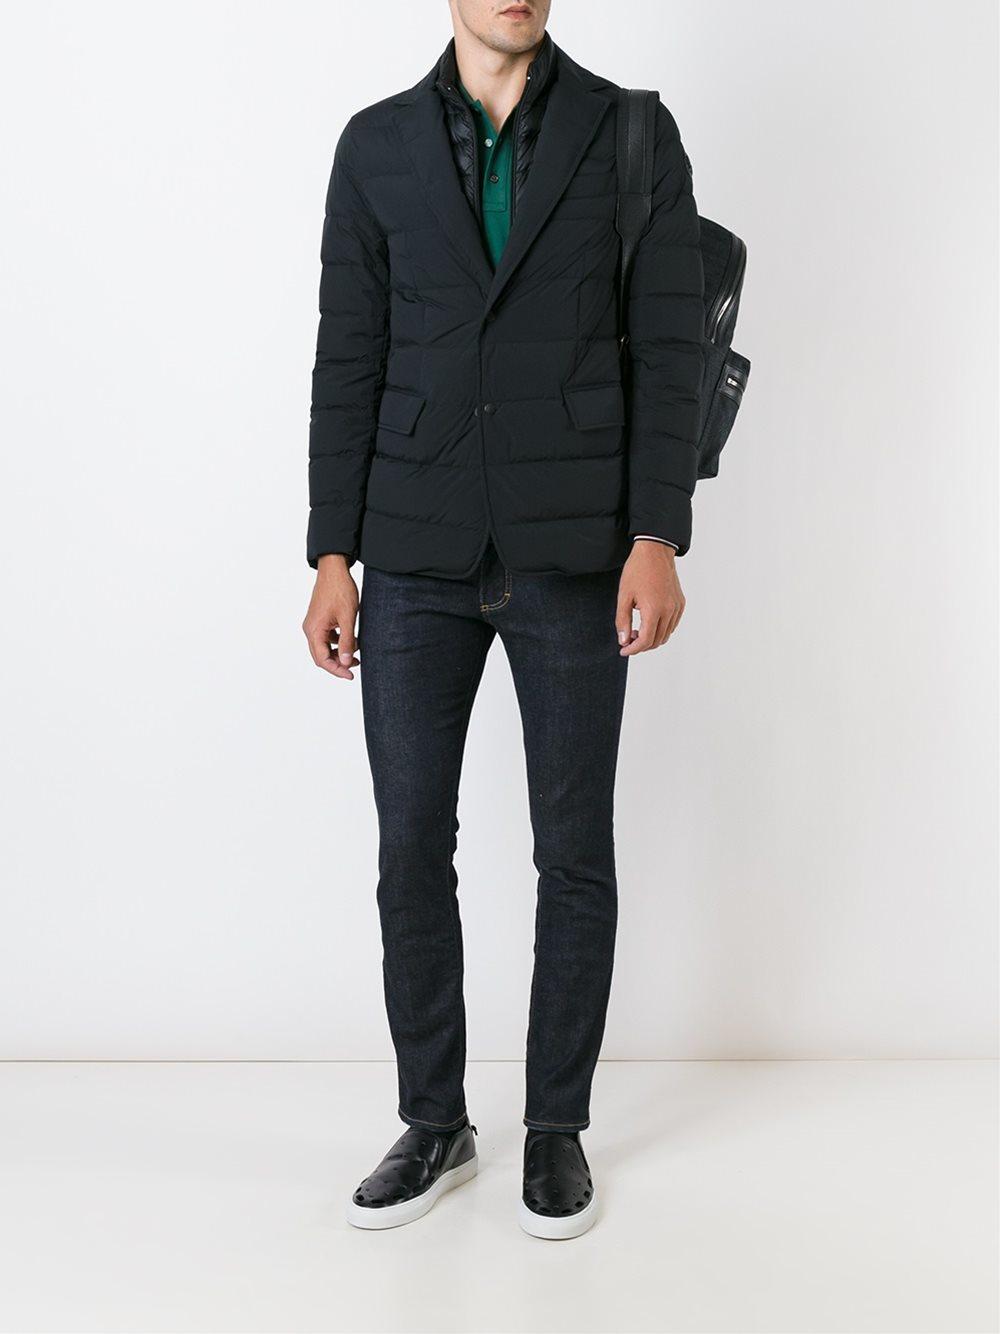 Moncler 'ferrand' Jacket in Black for Men